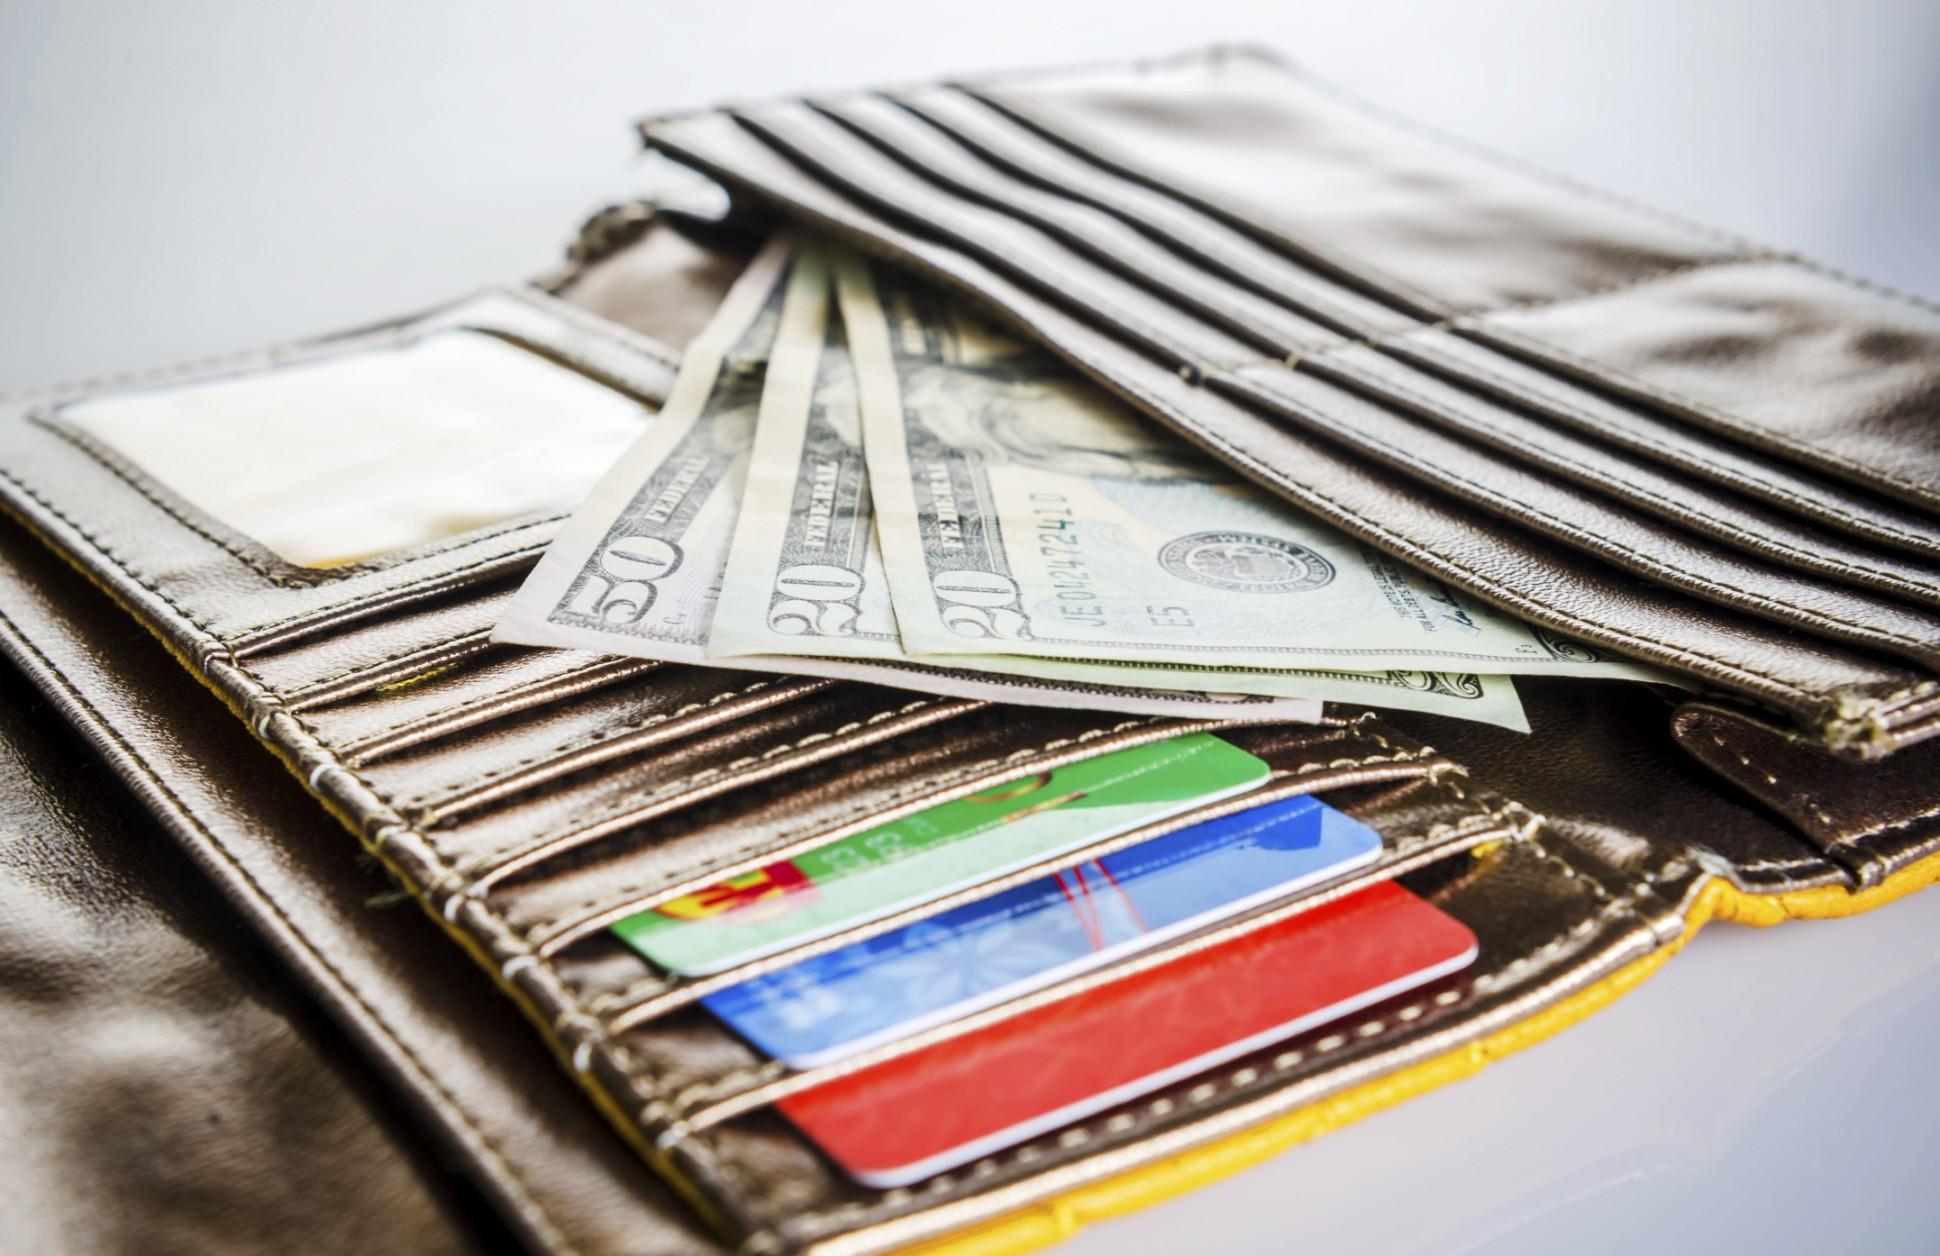 Best cash back rewards credit cards move your money project